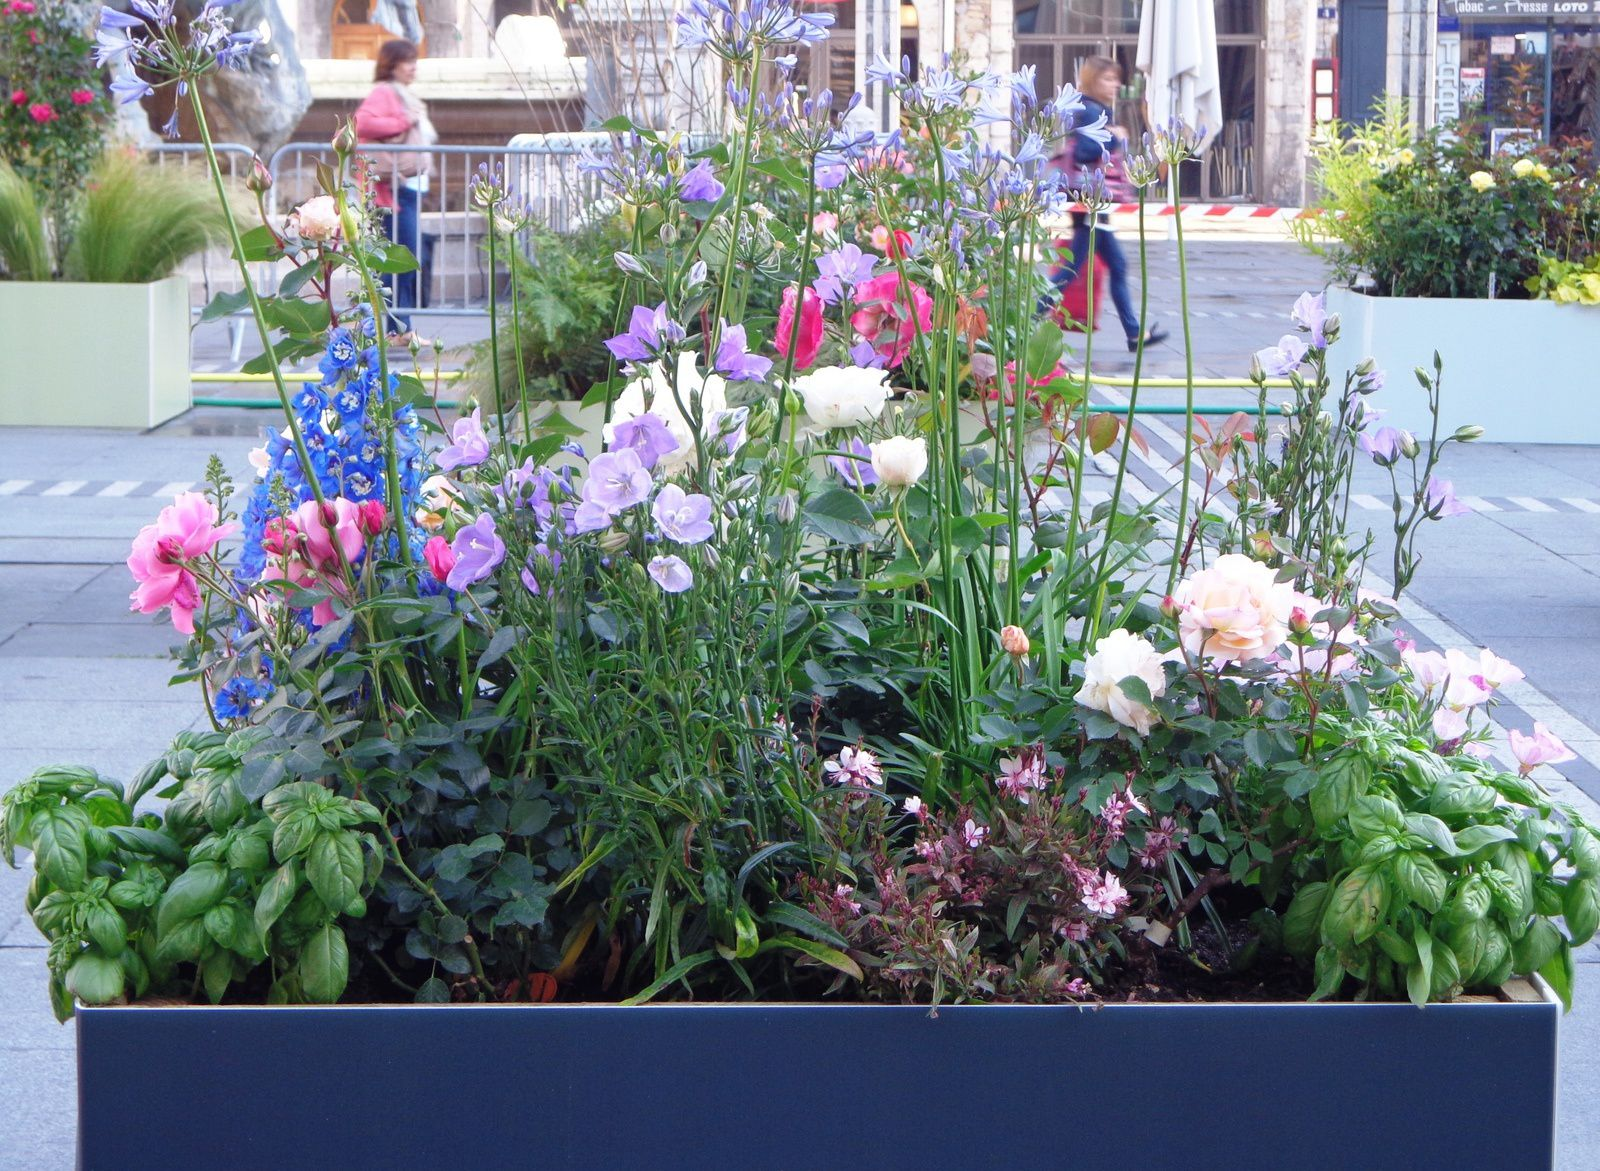 Lyon - Festival de roses !